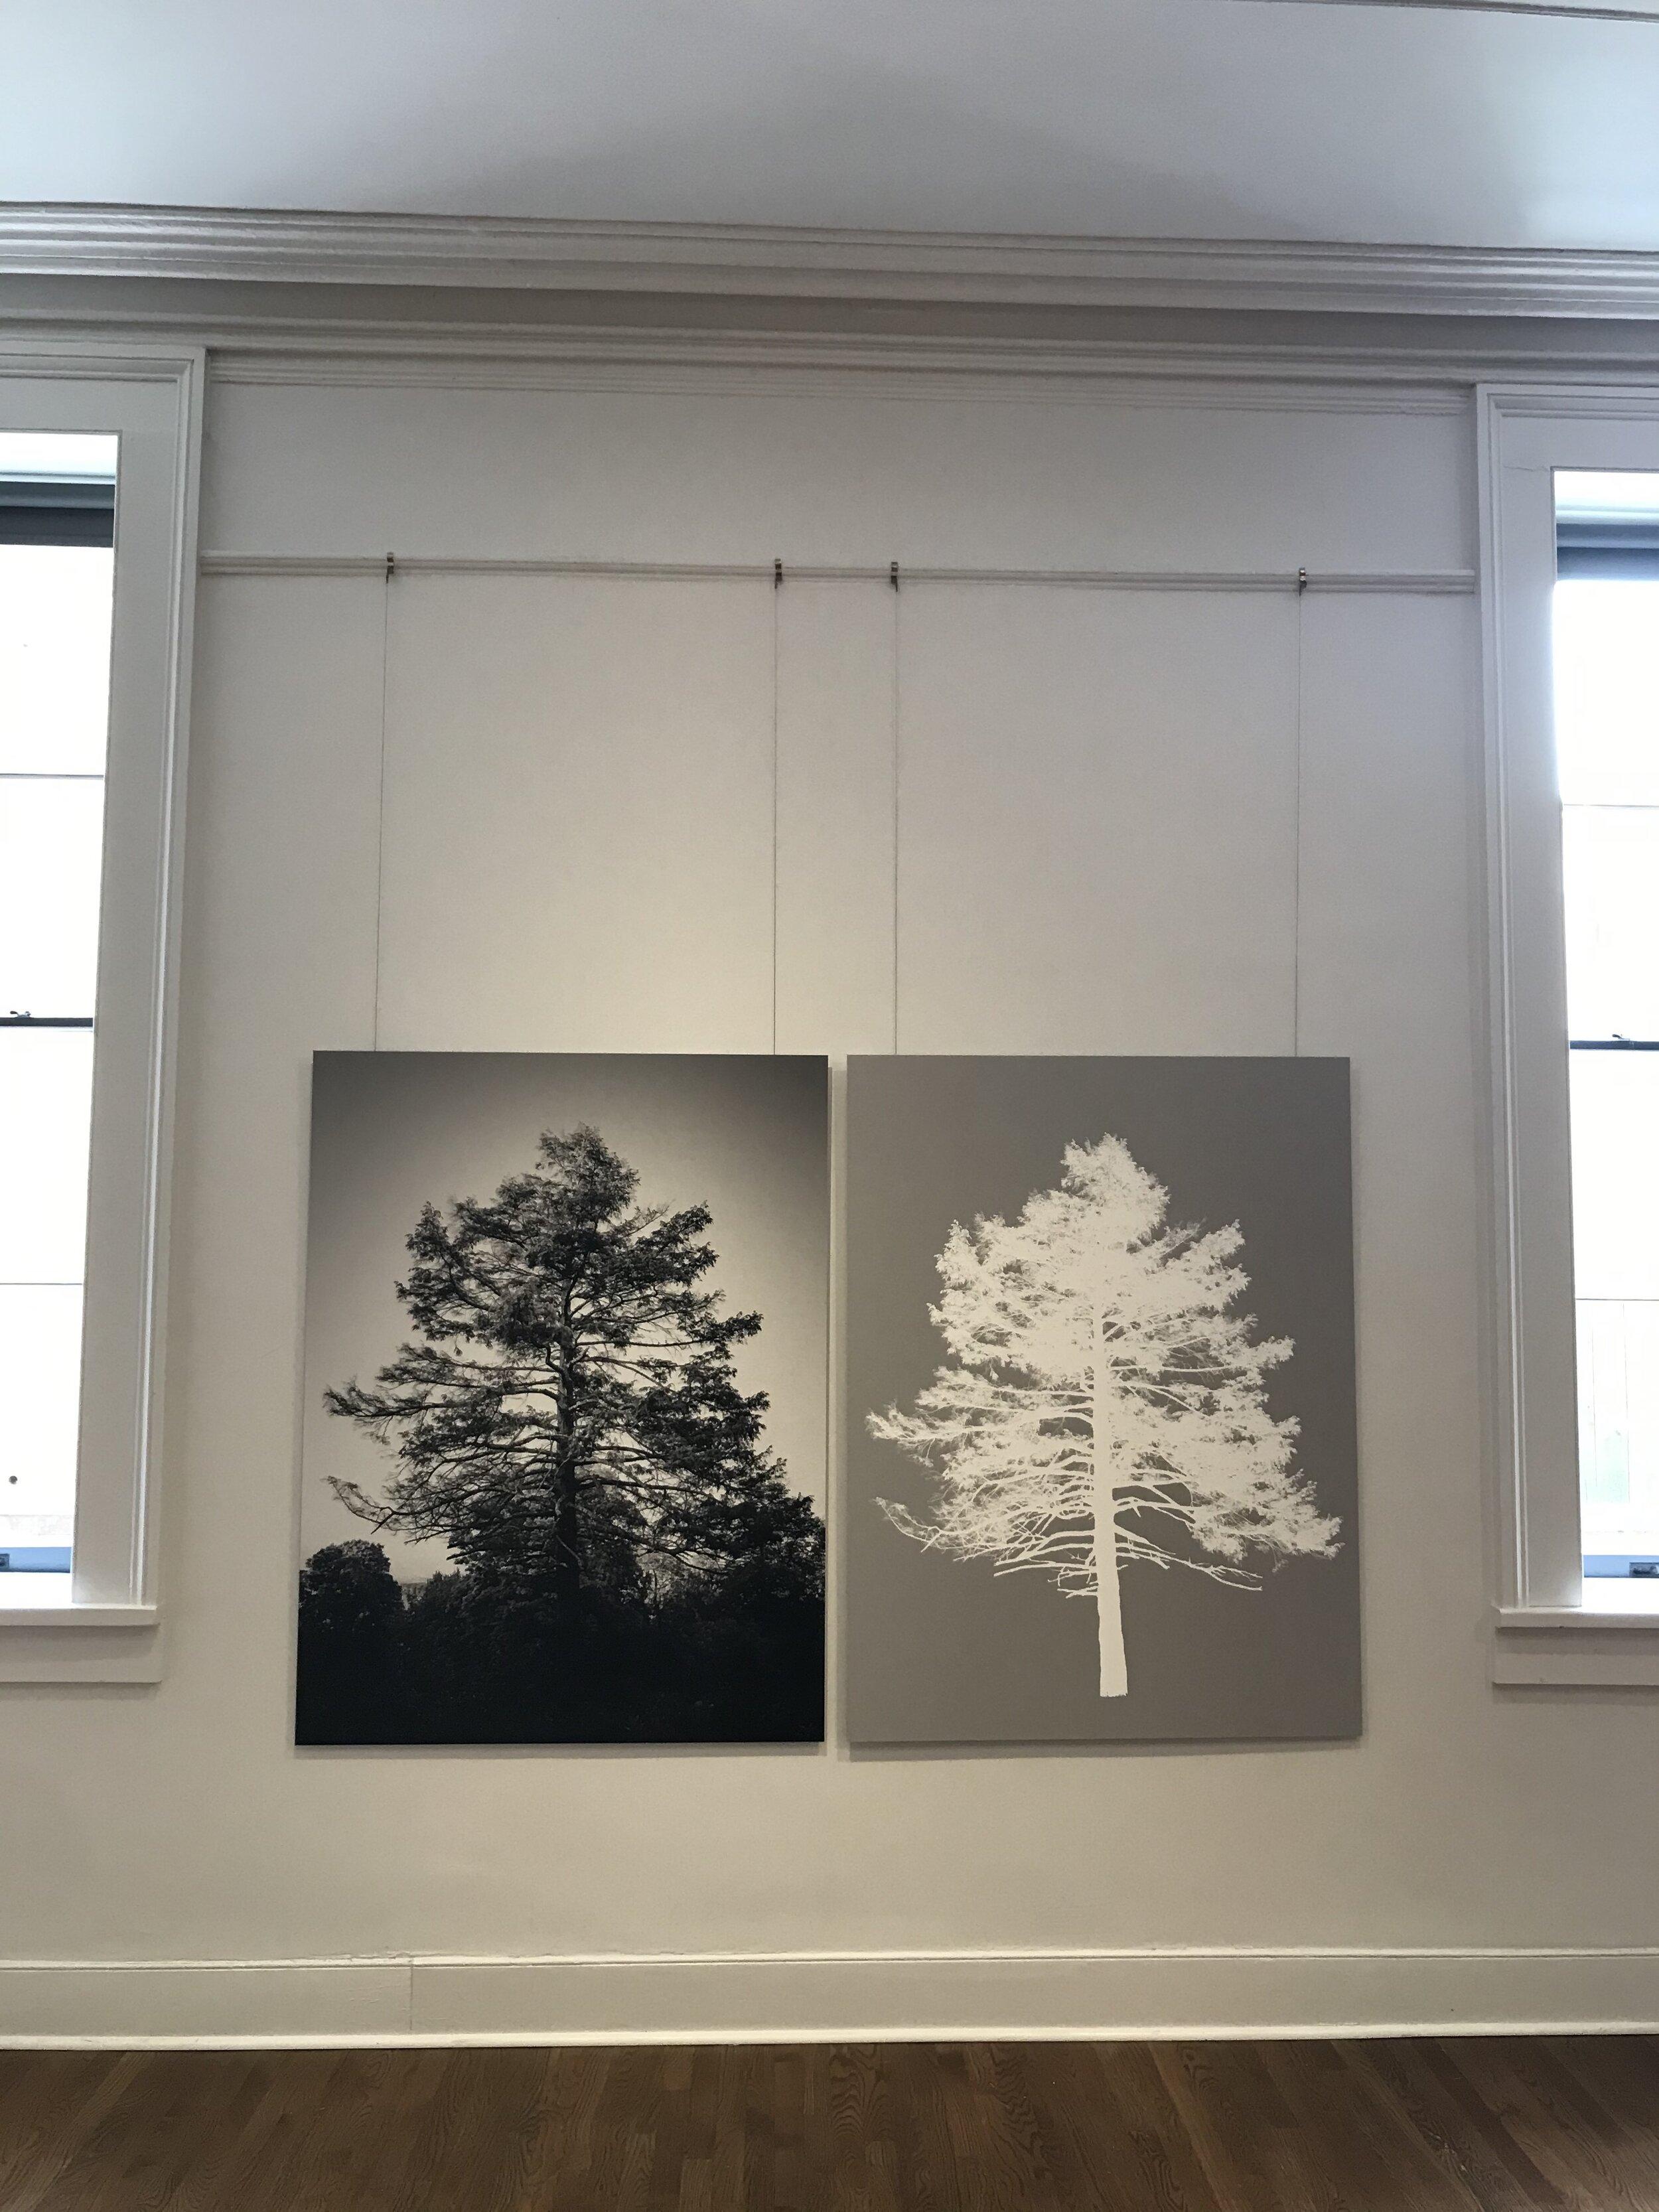 © Sarah Bird.  Frederic Edwin Church's Eastern Hemlock , 2019. Archival digital print mounted on dibond. Diptych, each panel 45 x 60 inches.